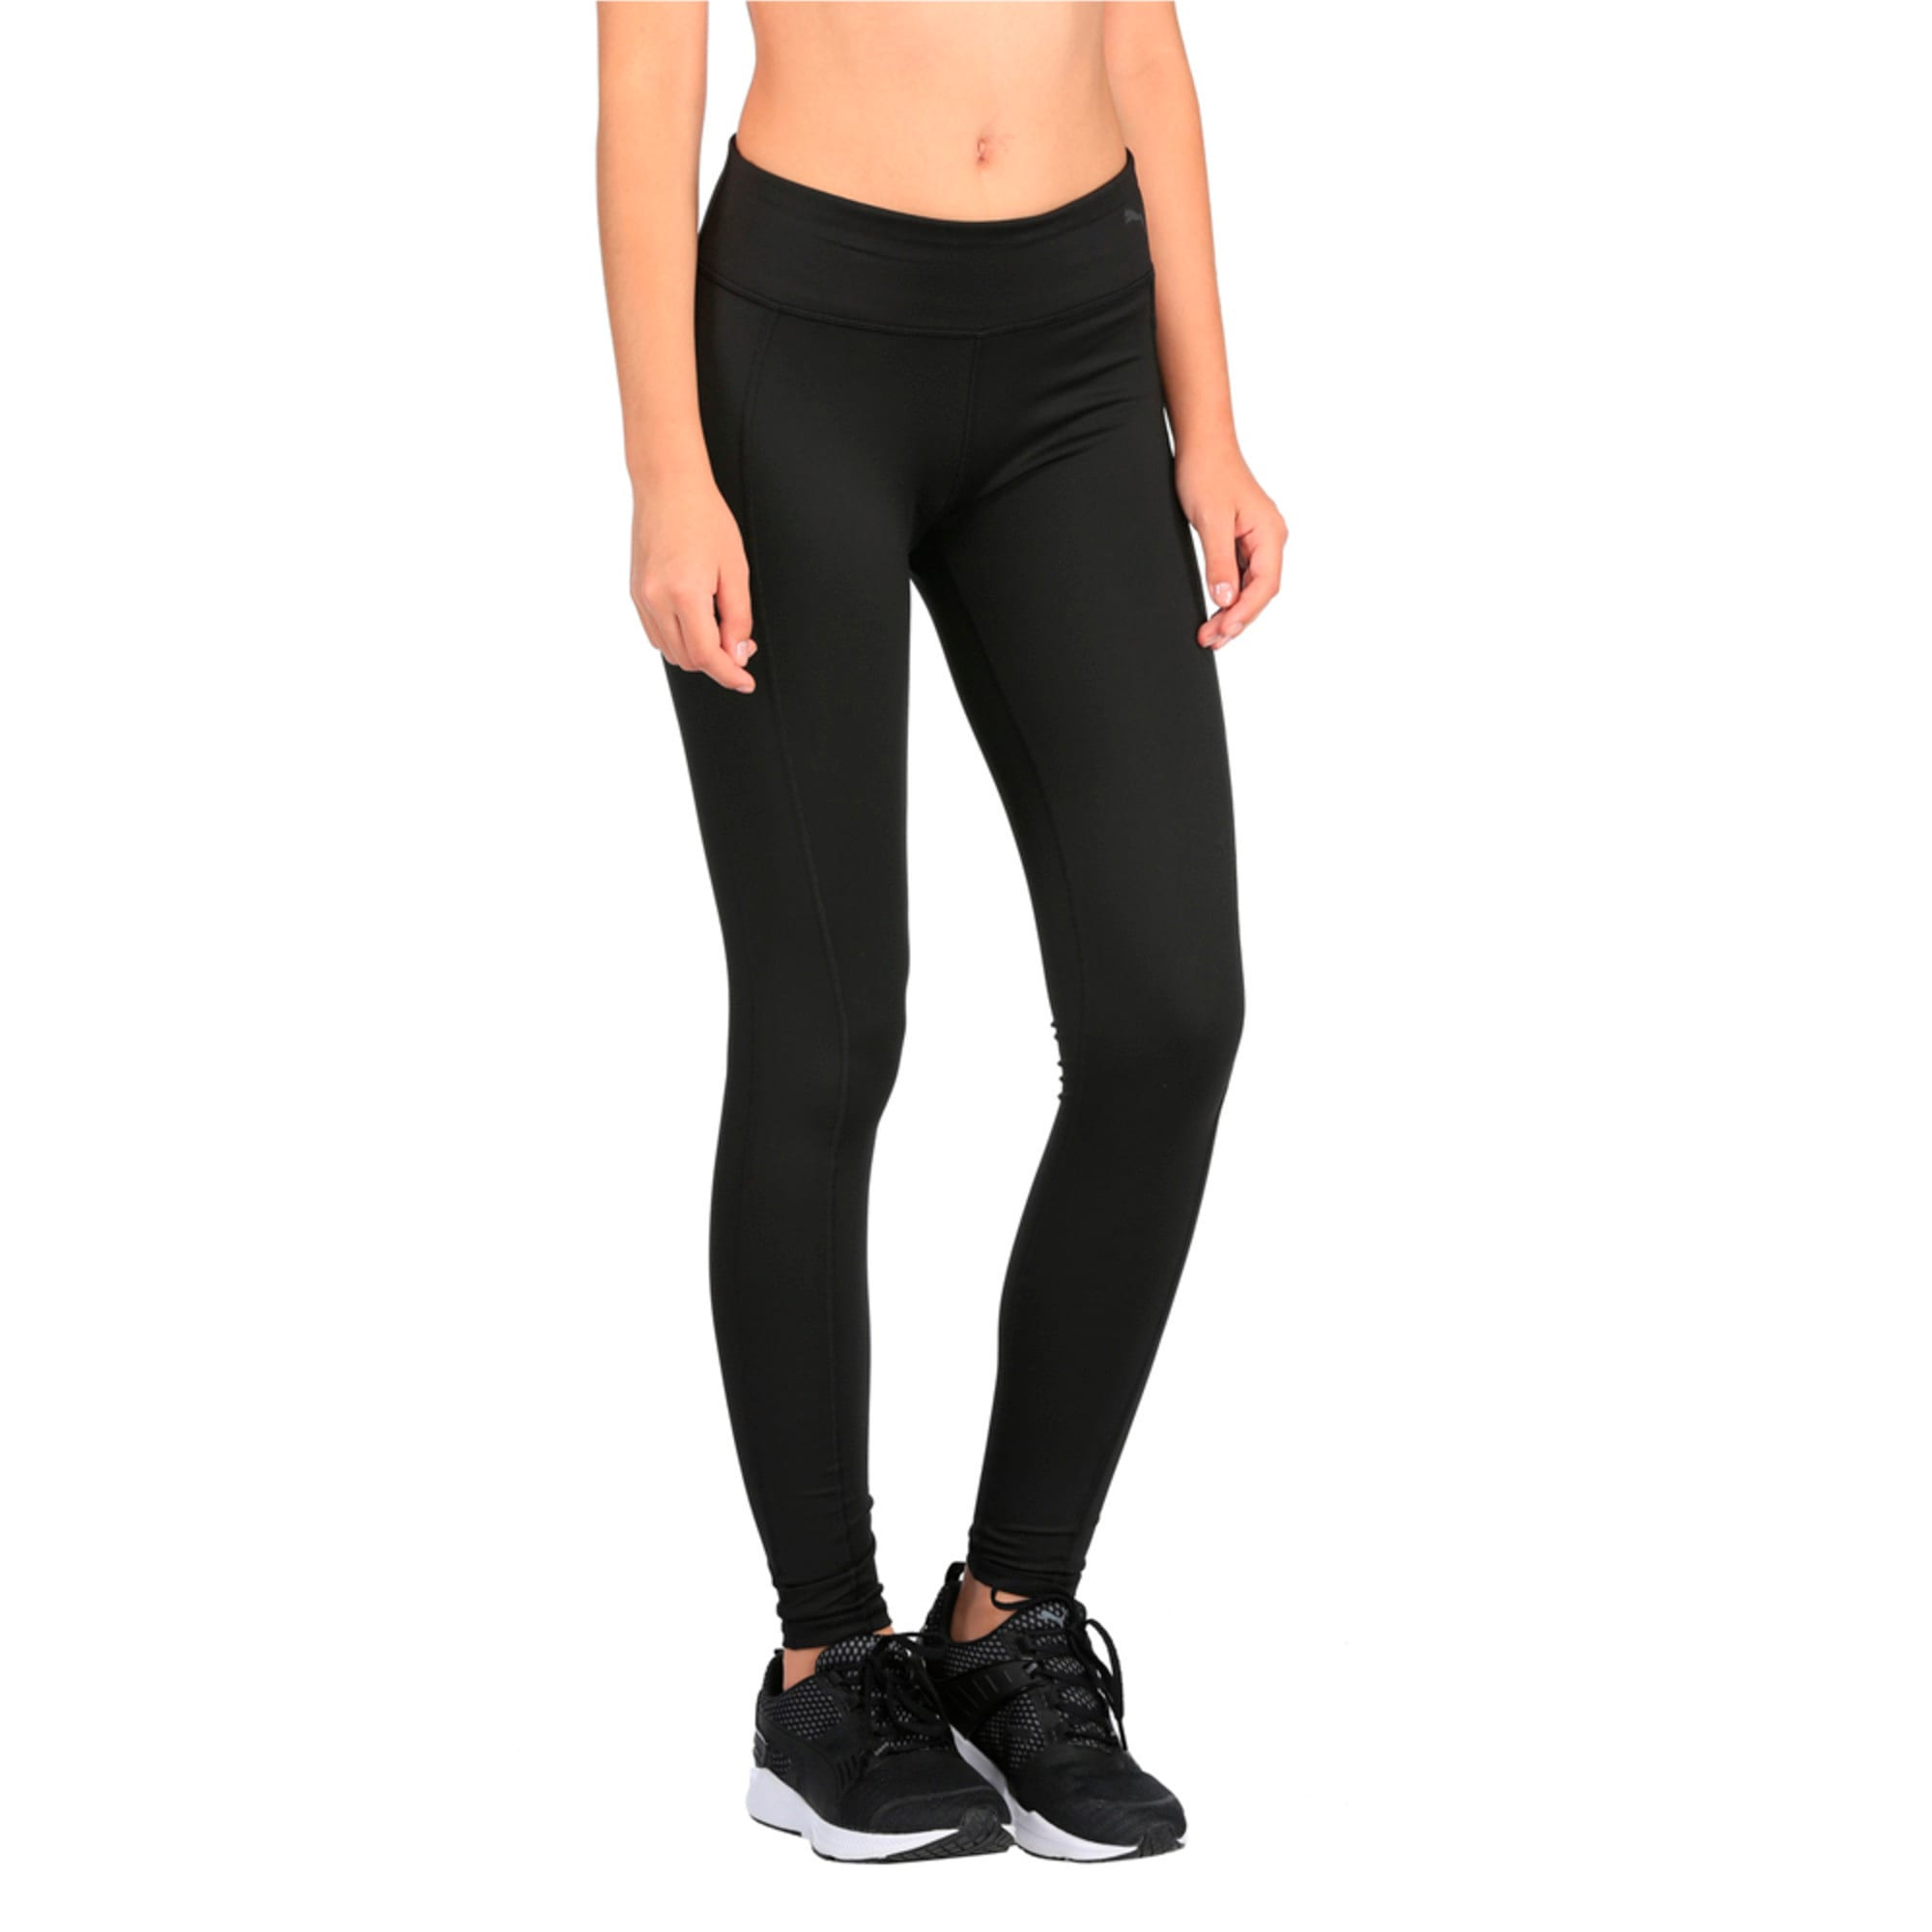 Thumbnail 1 of Training Women's Essential Tights, Puma Black, medium-IND